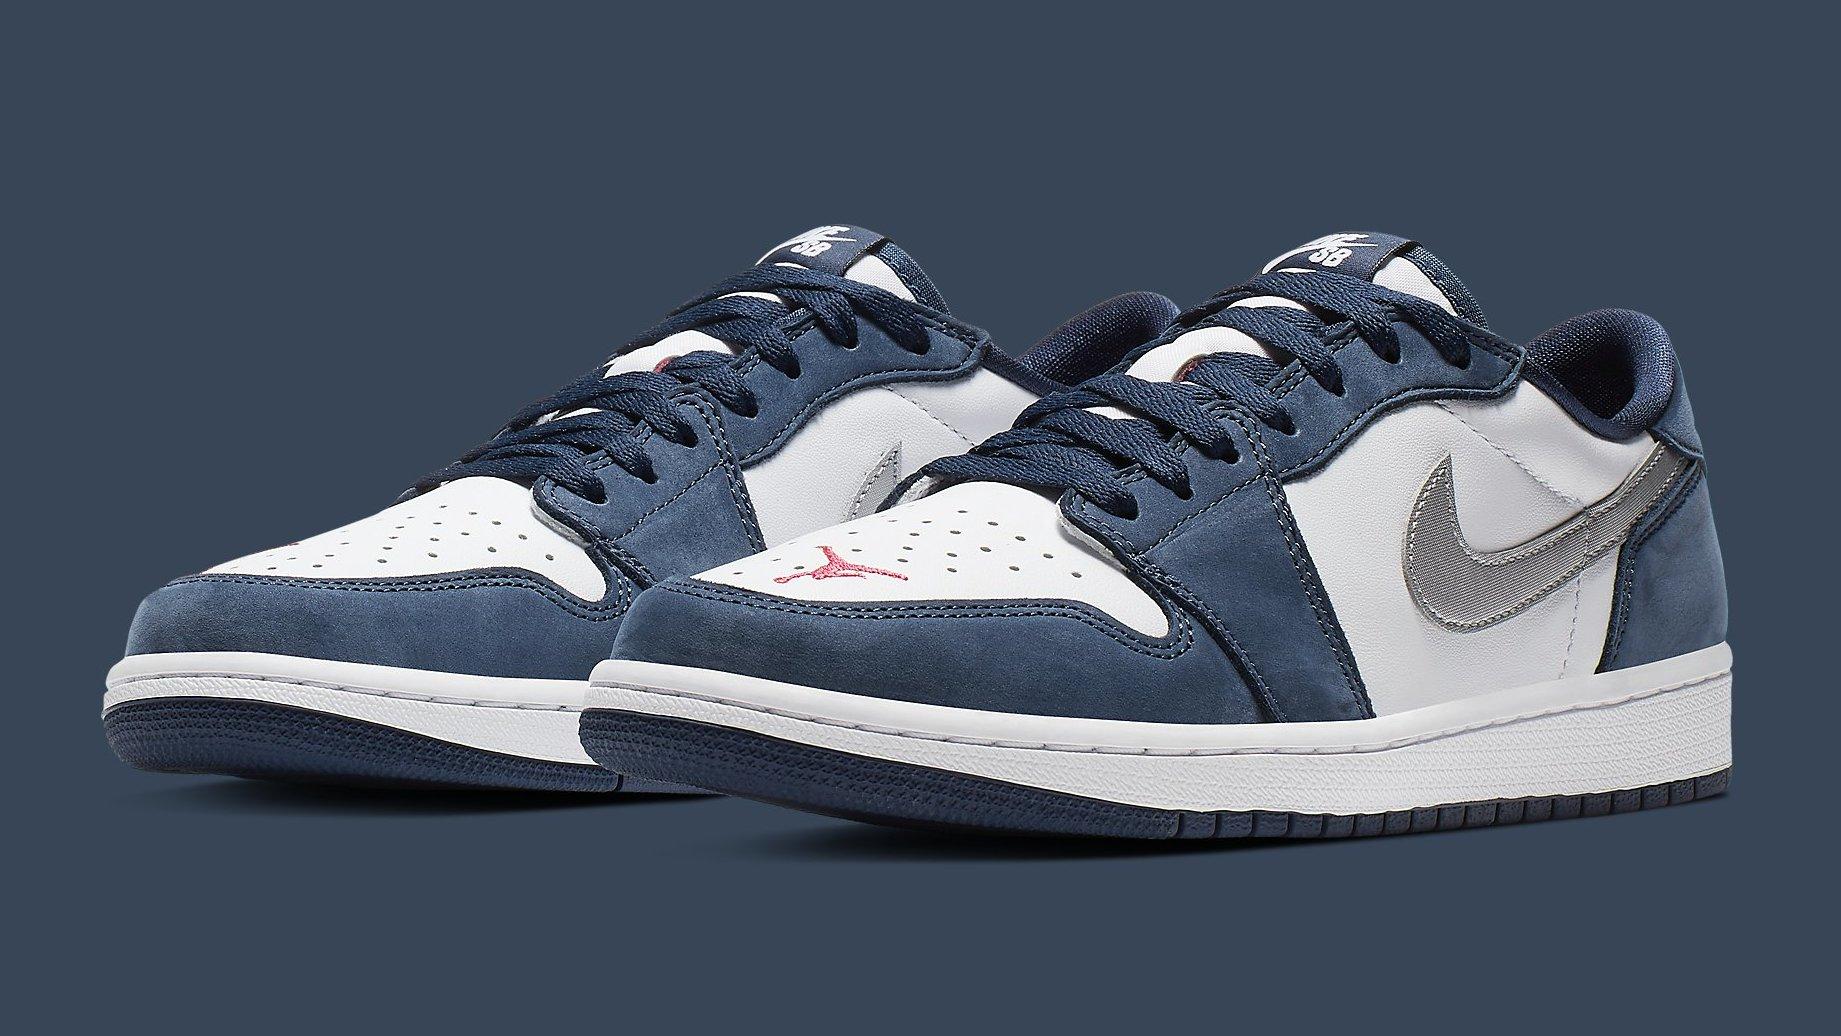 Nike SB x Air Jordan 1 Low 'Dark Powder Blue/White' 'Midnight Navy ...